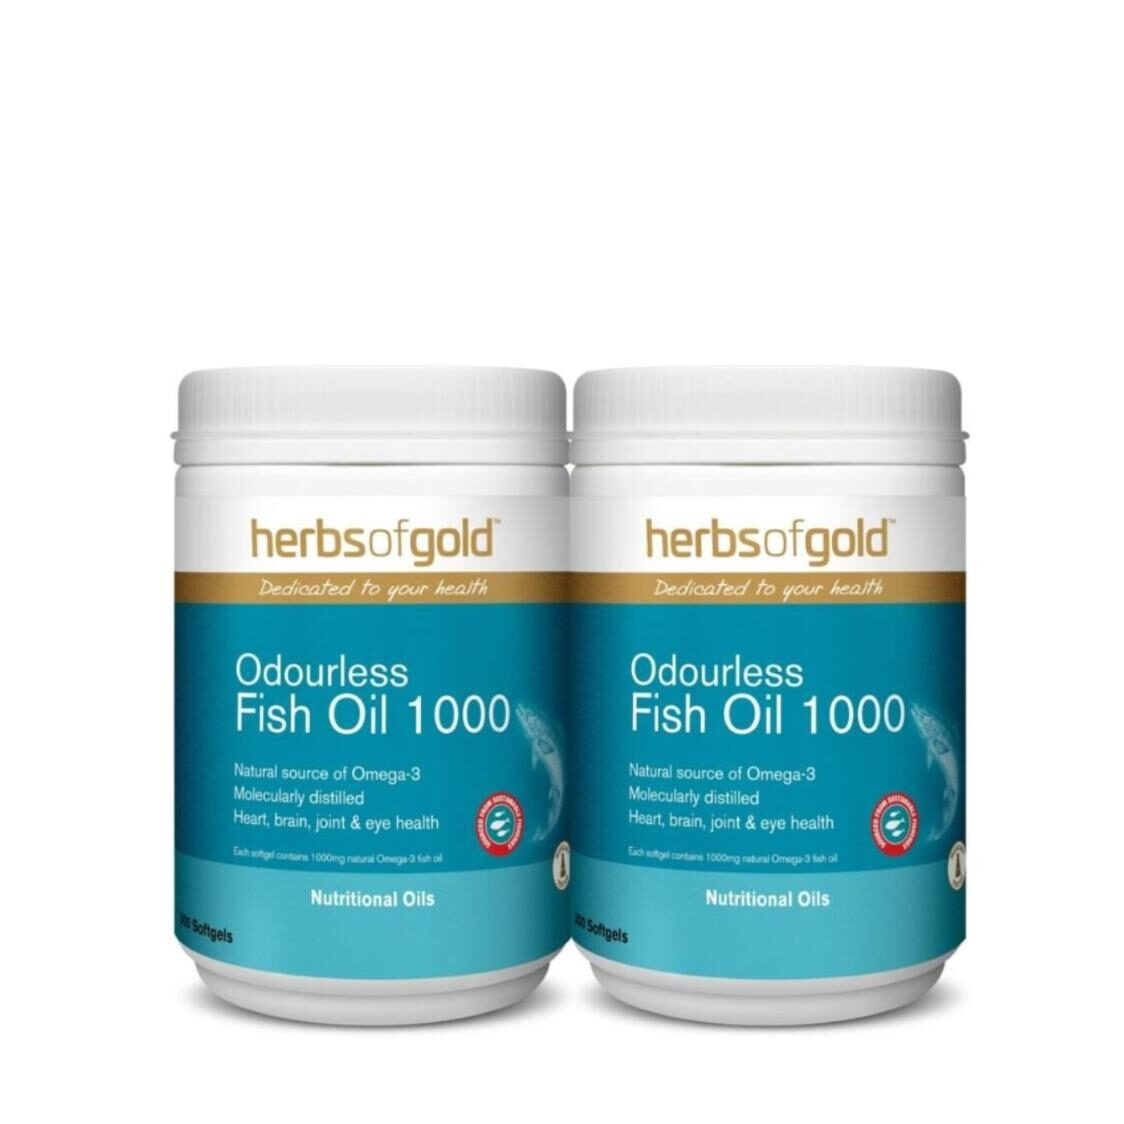 Herbs of Gold Odourless Omega-3 TG Fish Oil 2x300s